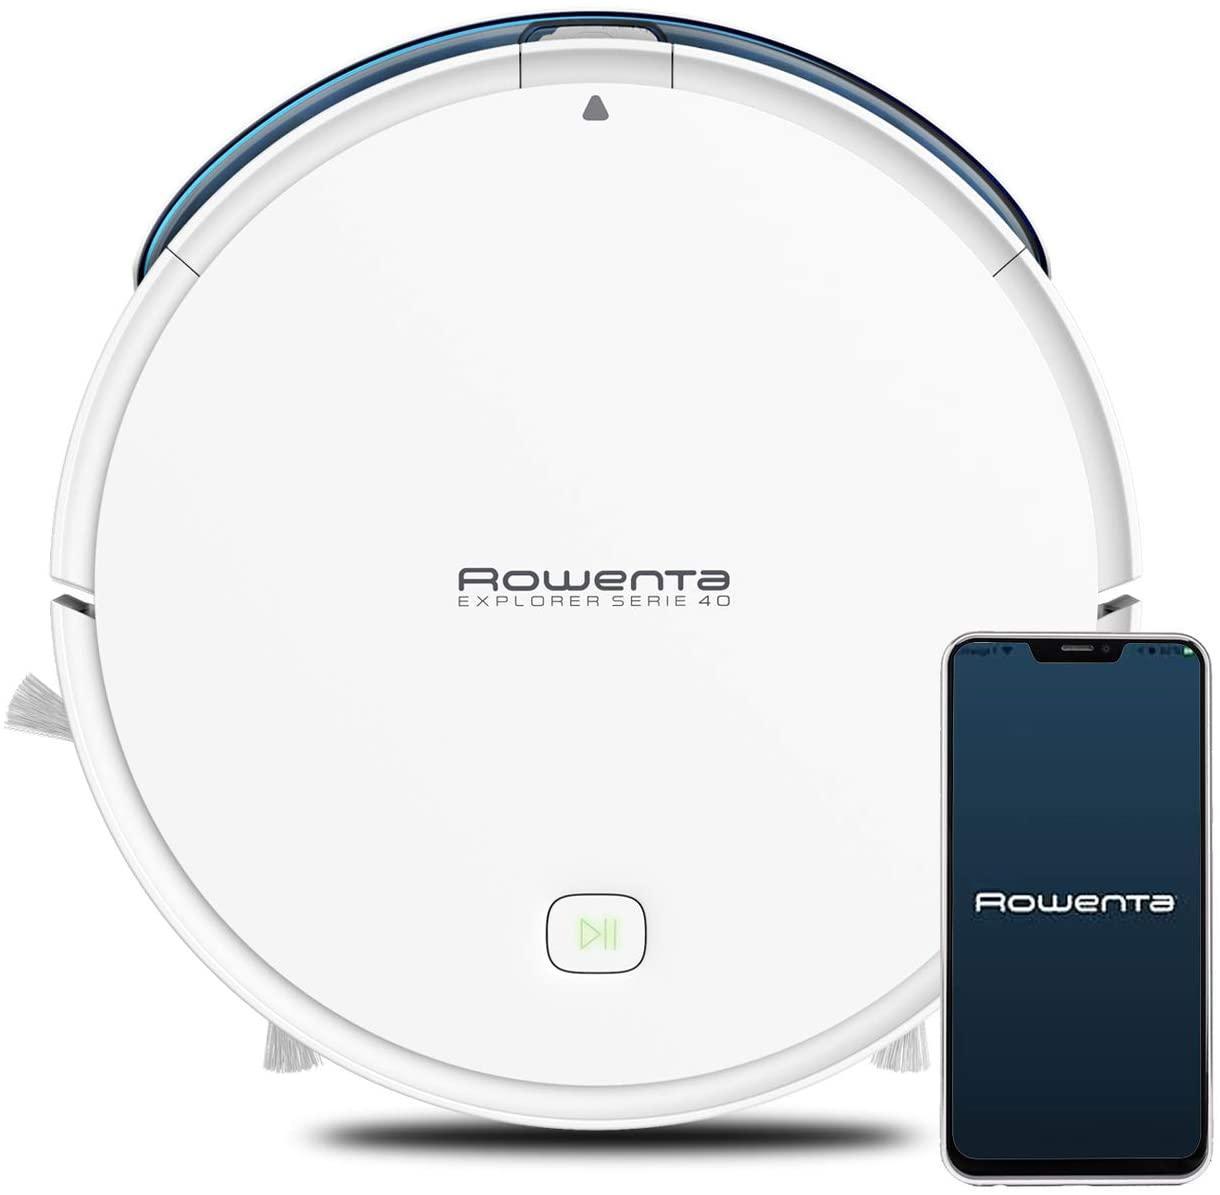 Rowenta Explorer Serie 40